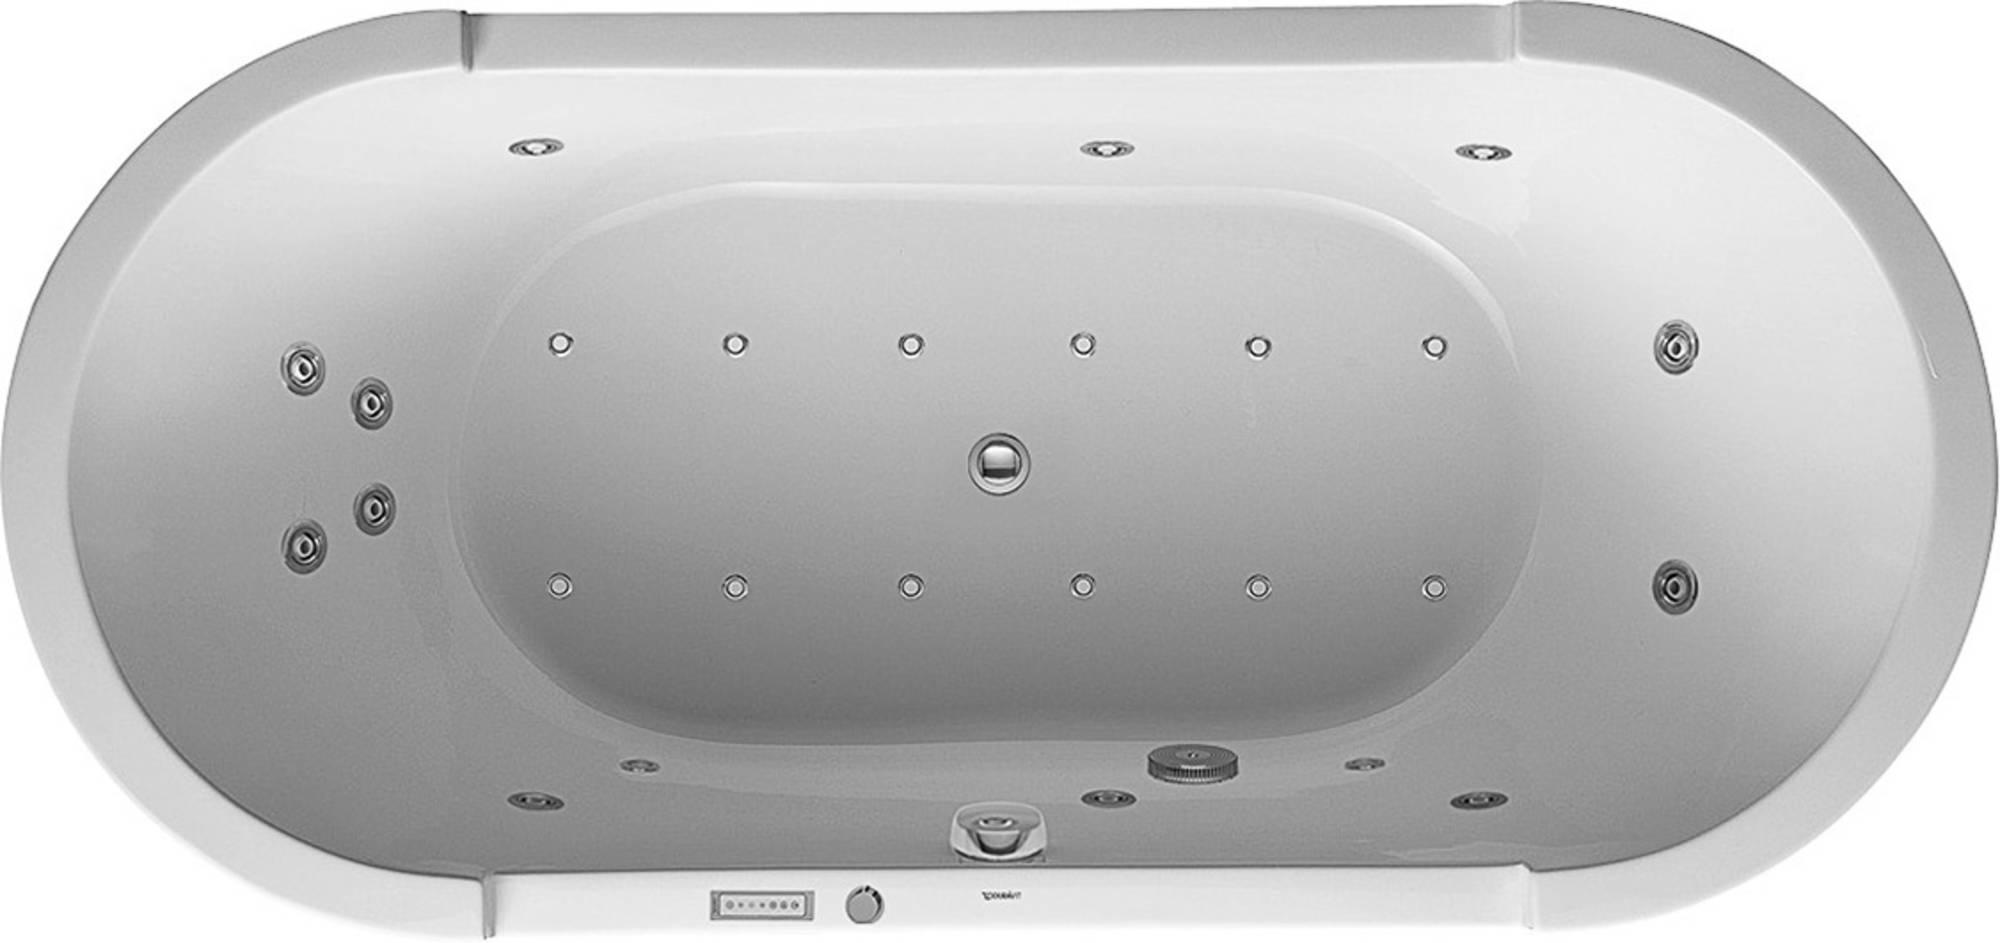 Duravit Starck Systeembad 225 liter Acryl 190x90 cm Wit